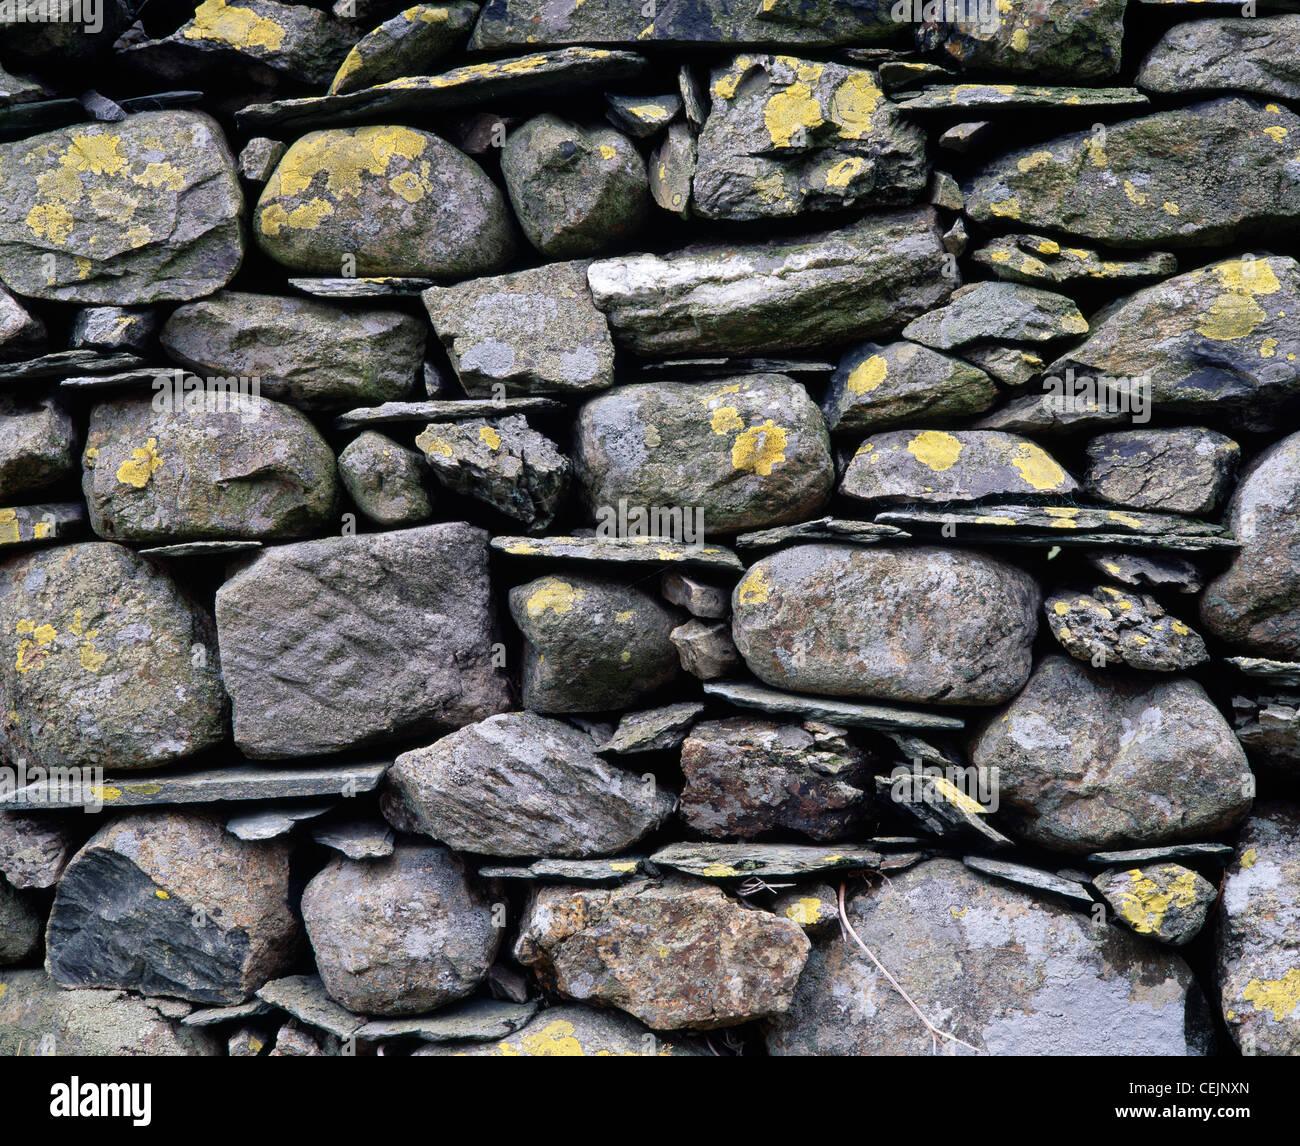 Drystone muro cerca. Newlands valle, Cumbria, Inglaterra, Reino Unido. En el Lake District National Park. Imagen De Stock